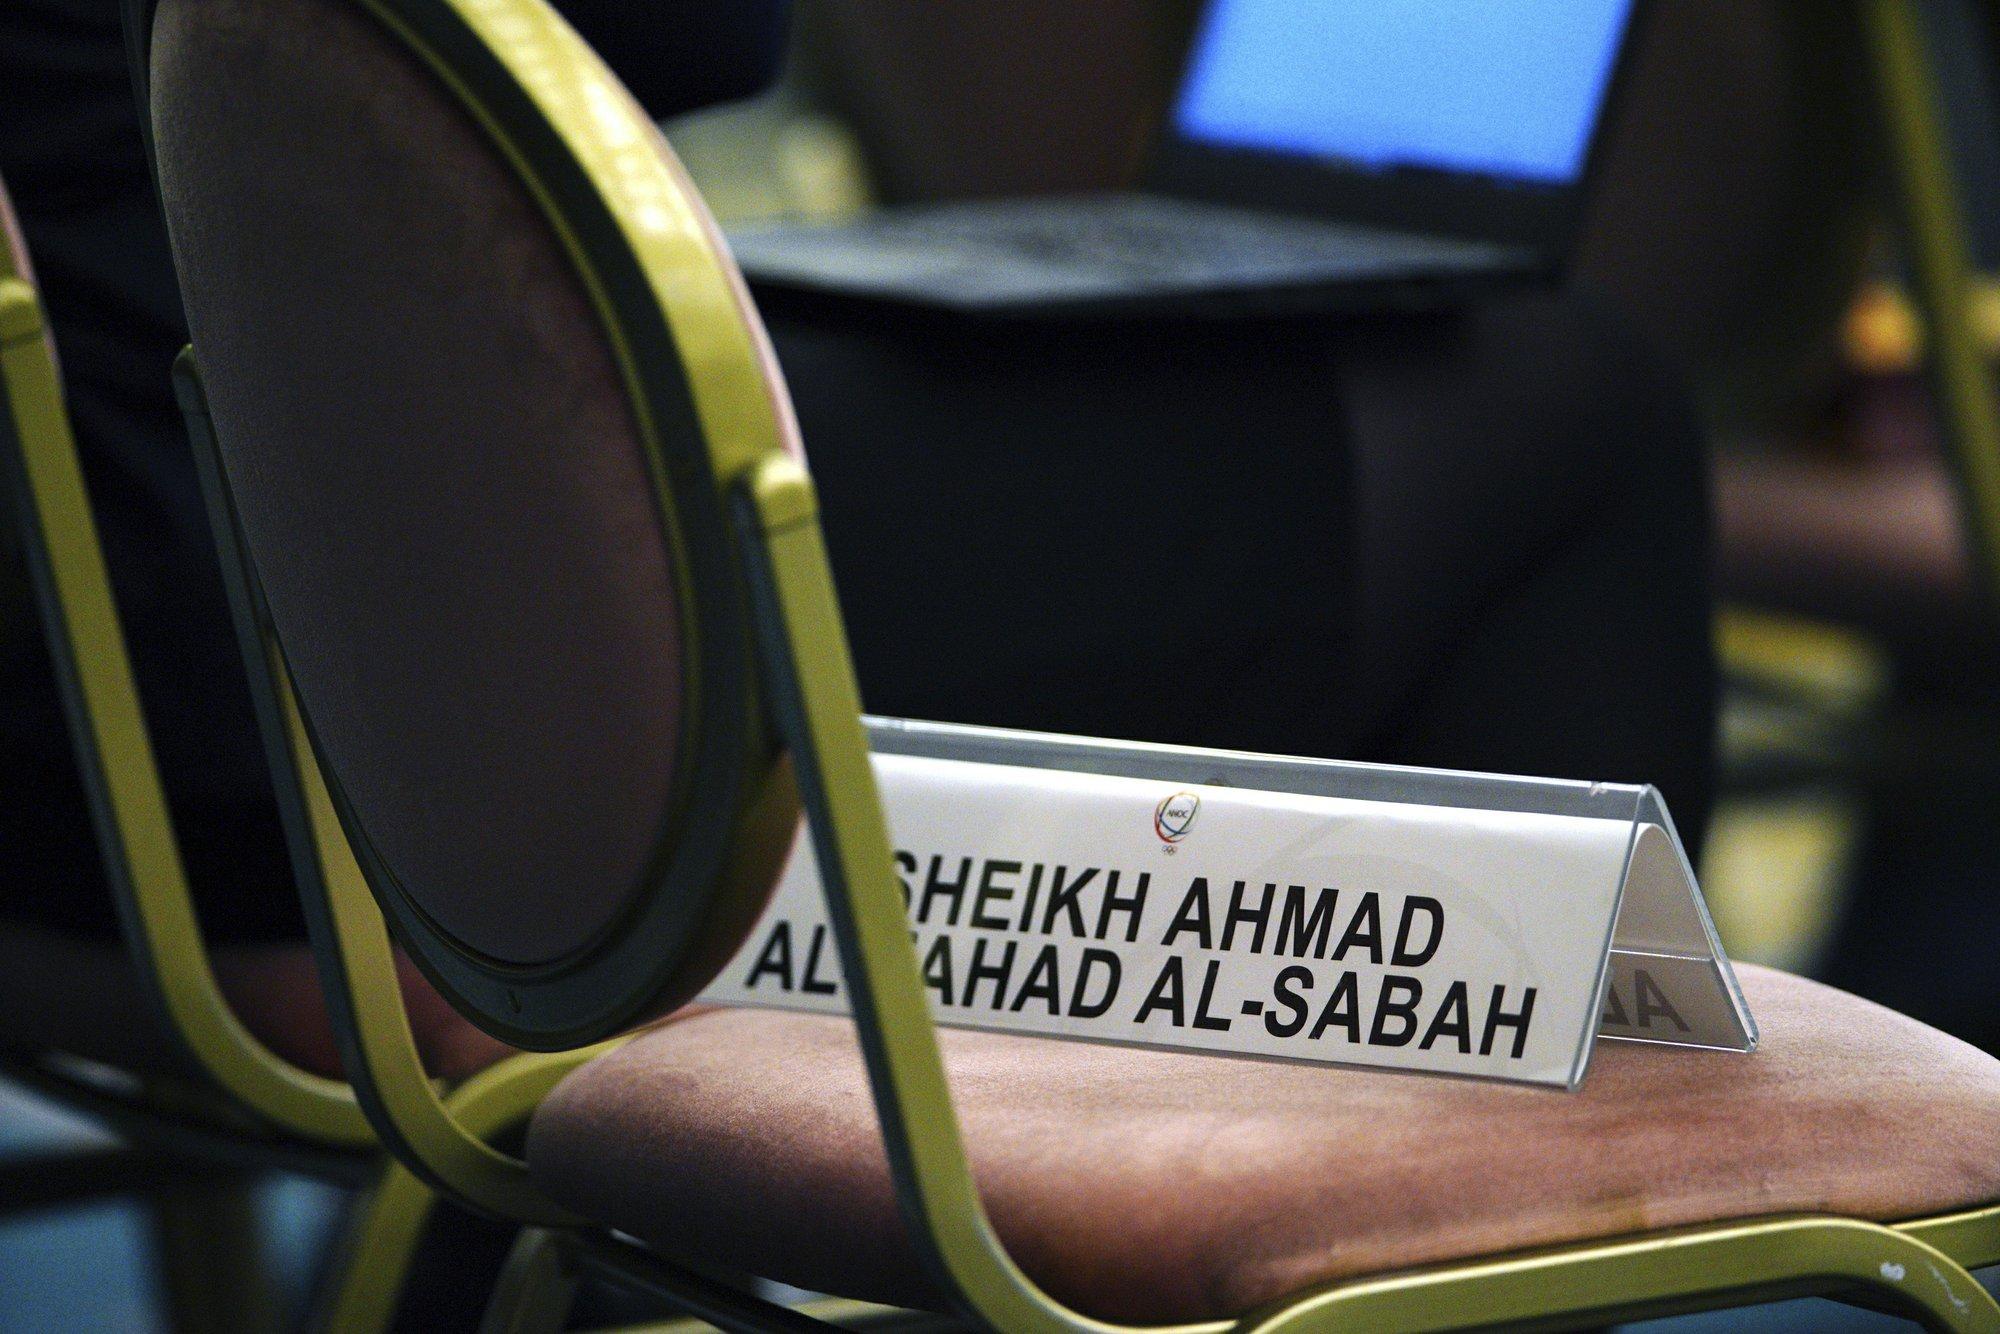 IOC President Bach lavishes praise on suspended Sheikh Ahmad